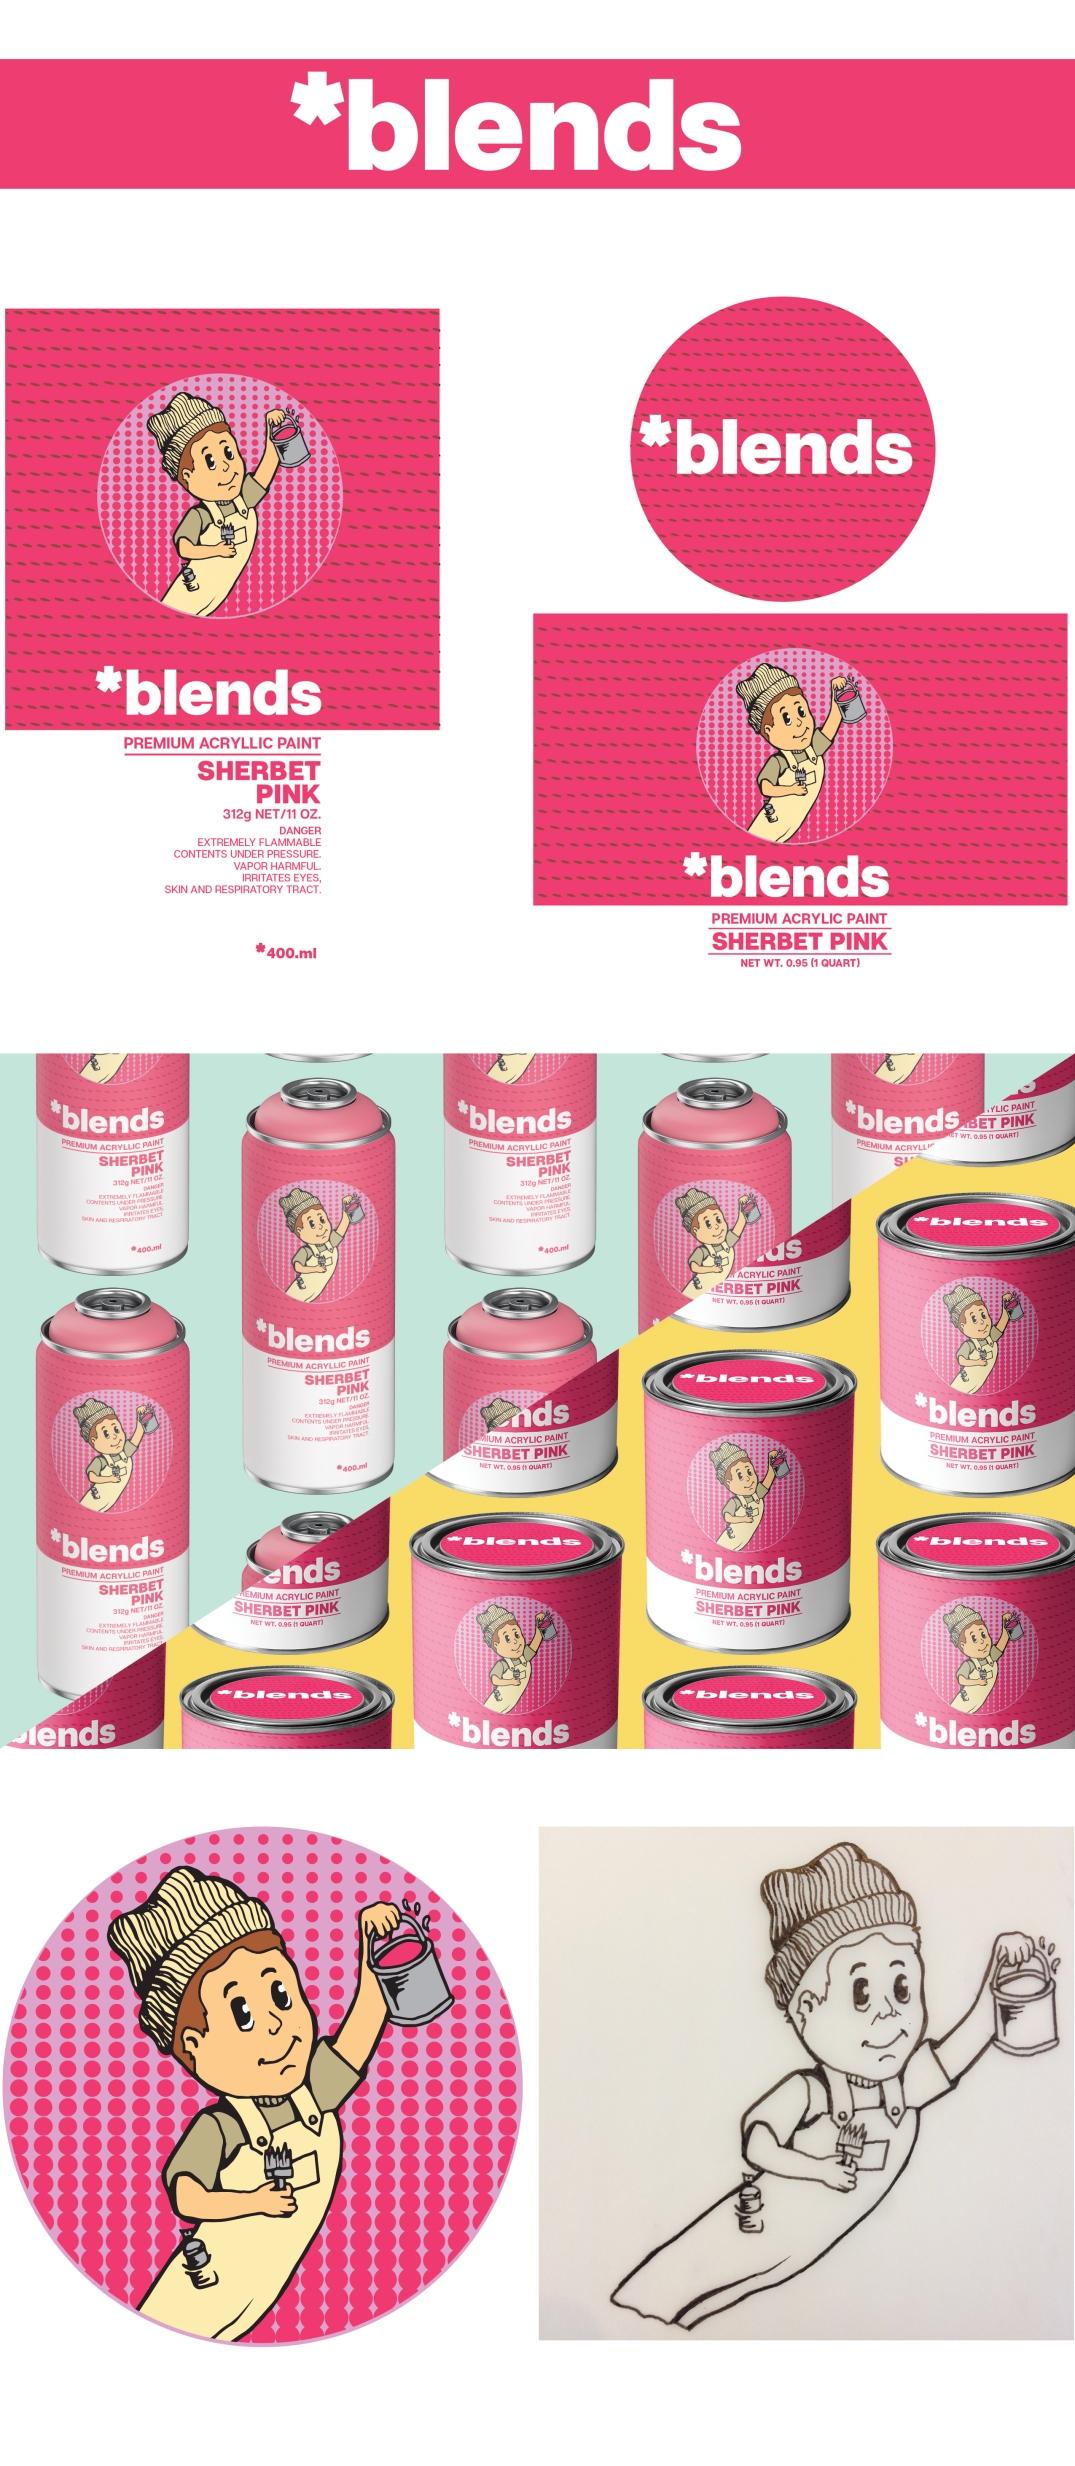 blends-website-layout